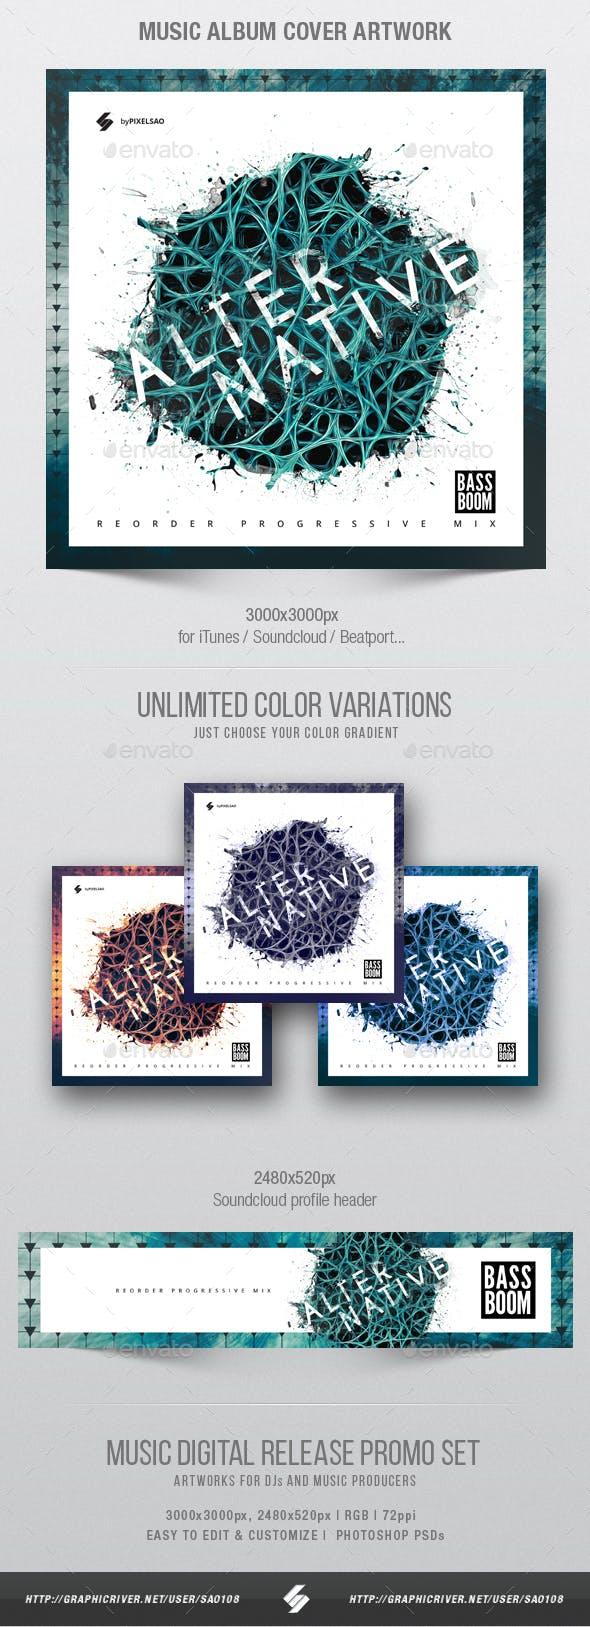 alternative music album cover artwork template by sao108